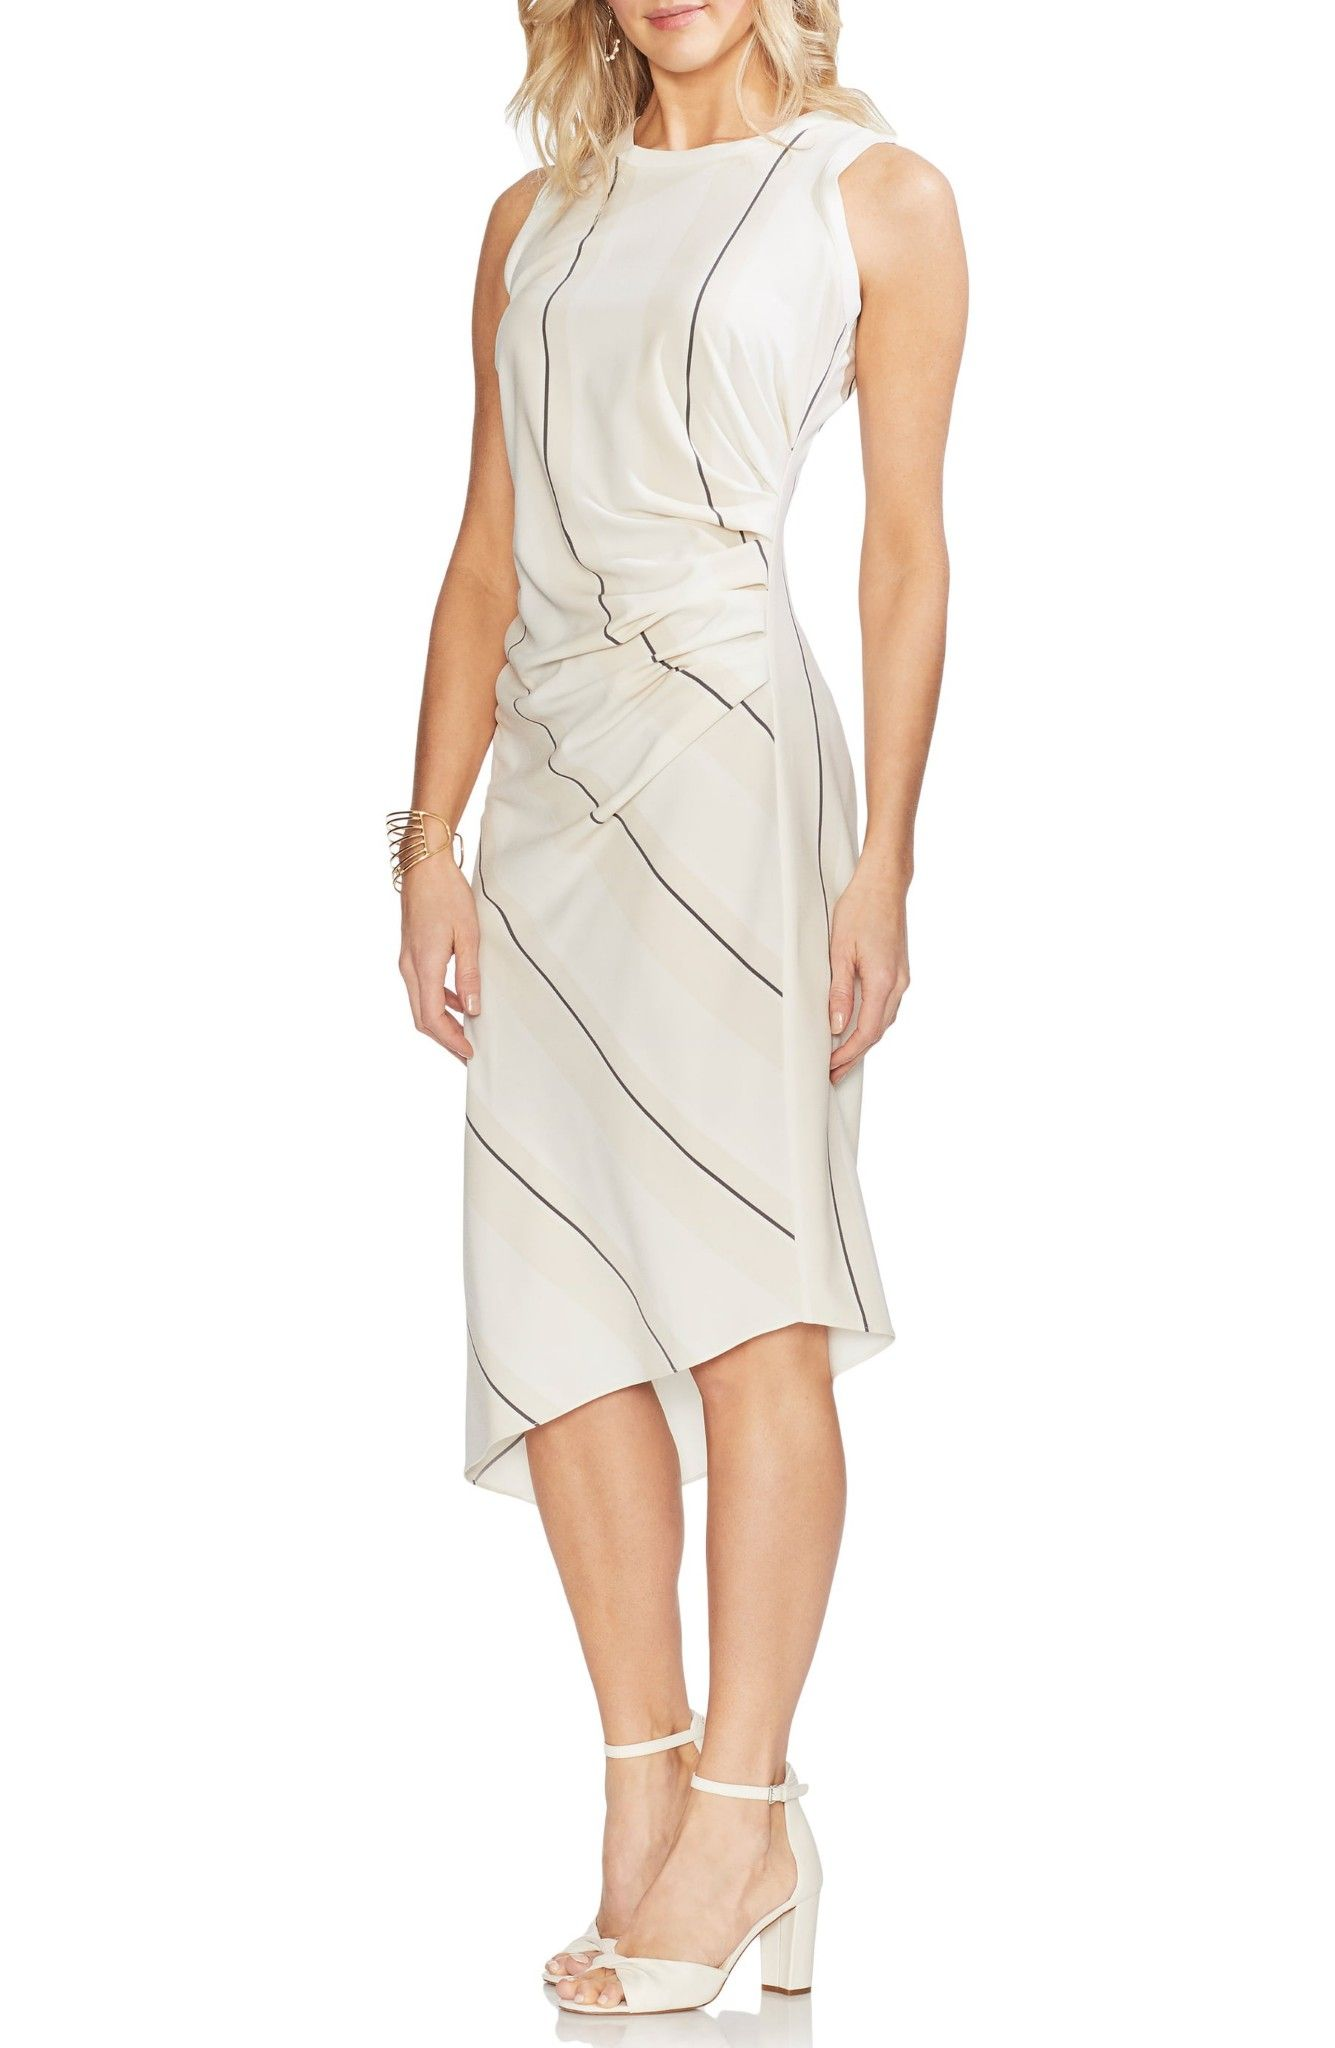 Pin By Amanda Sergent On Clothing Striped Sleeveless Dress Dresses Ruched Midi Dress [ 2048 x 1335 Pixel ]